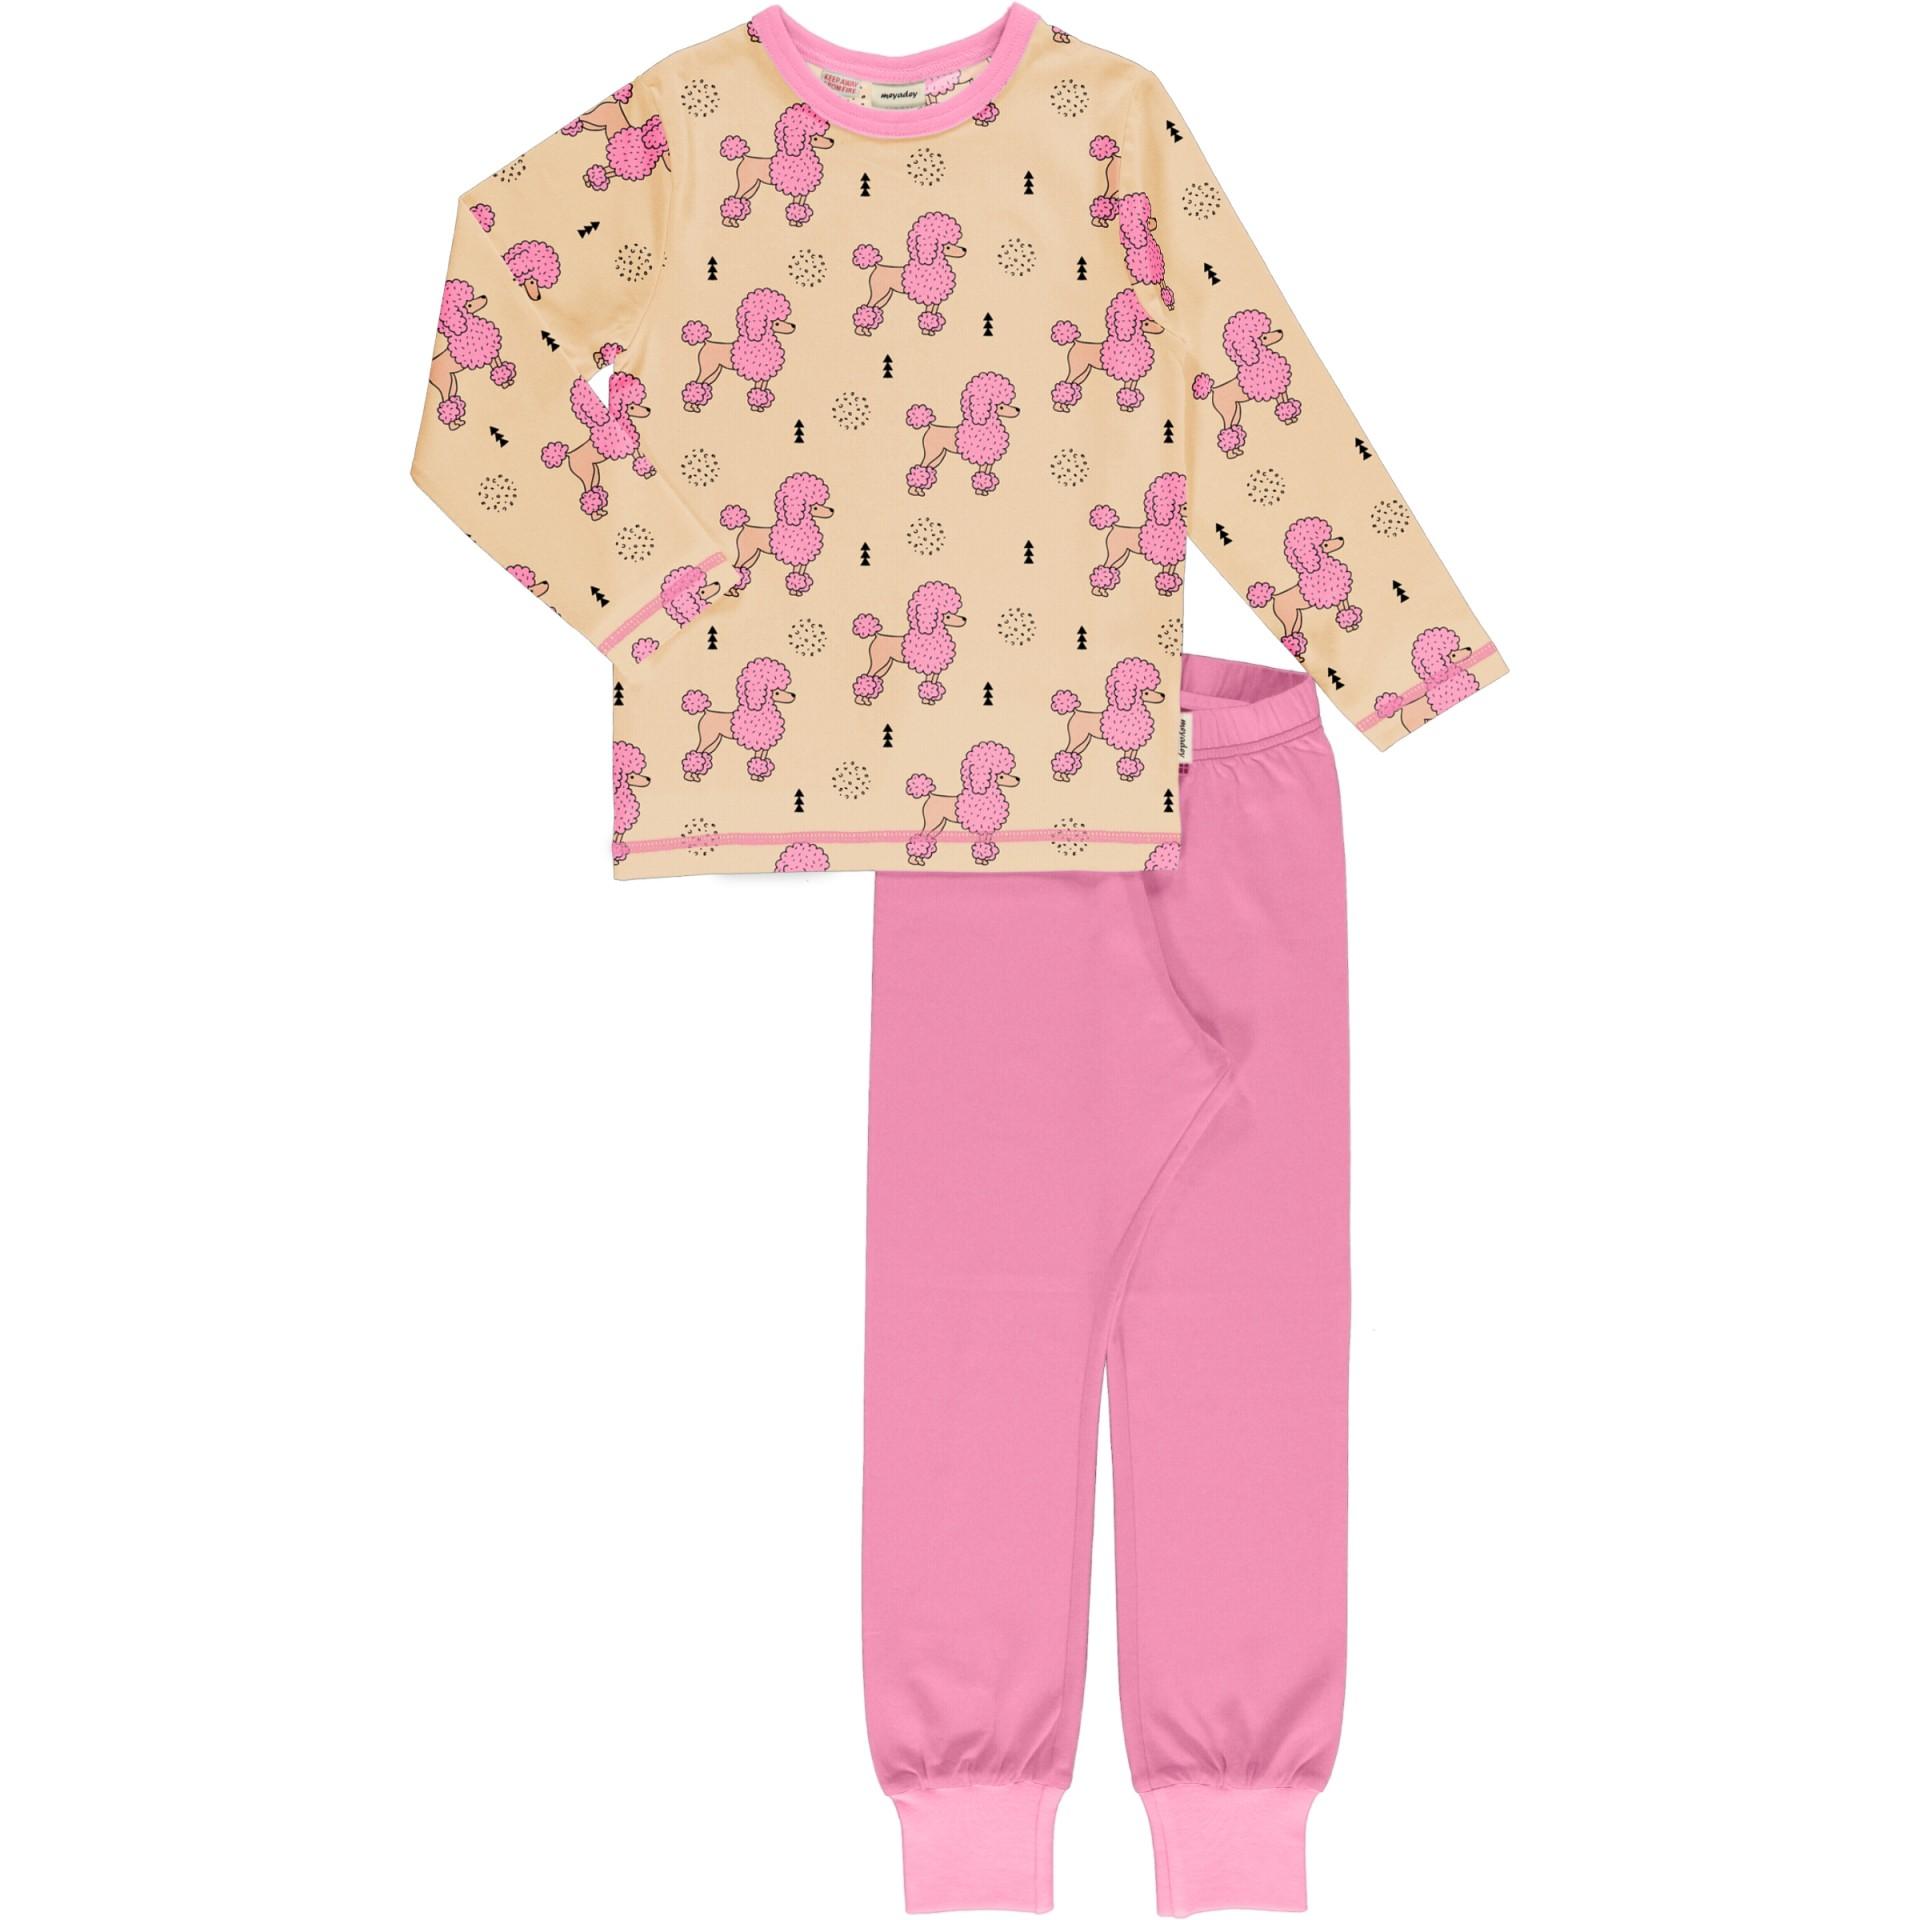 Pijama Perky Poodle Meyaday (Tamanhos disponíveis 5-6a, 7-8a, 9-10a )